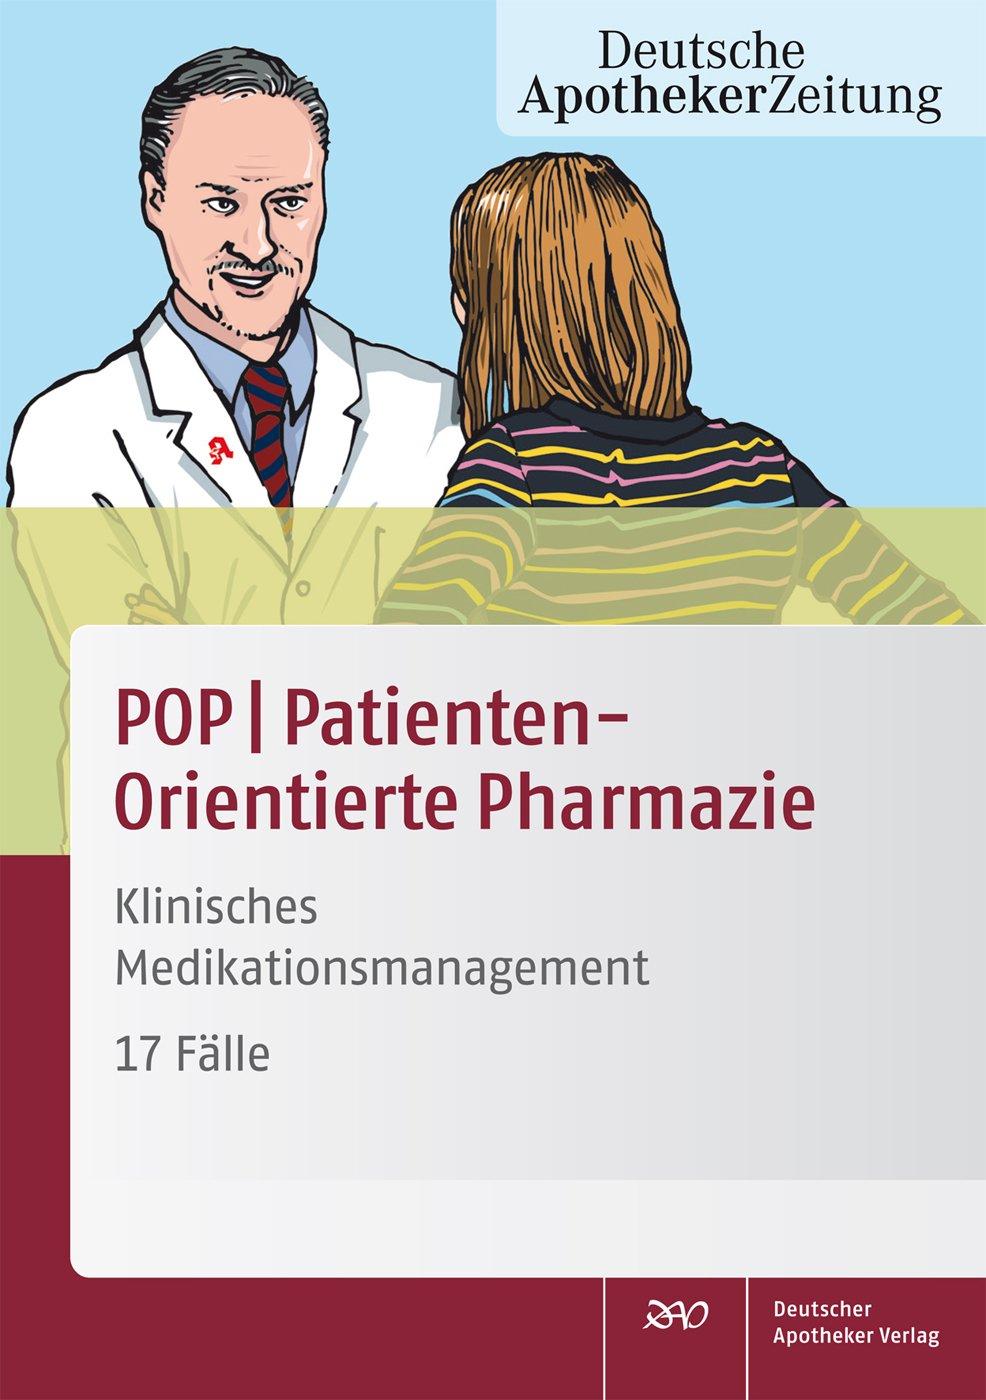 Hauptstudium Pharmazie - Shop - Mediengruppe Deutscher Apotheker Verlag